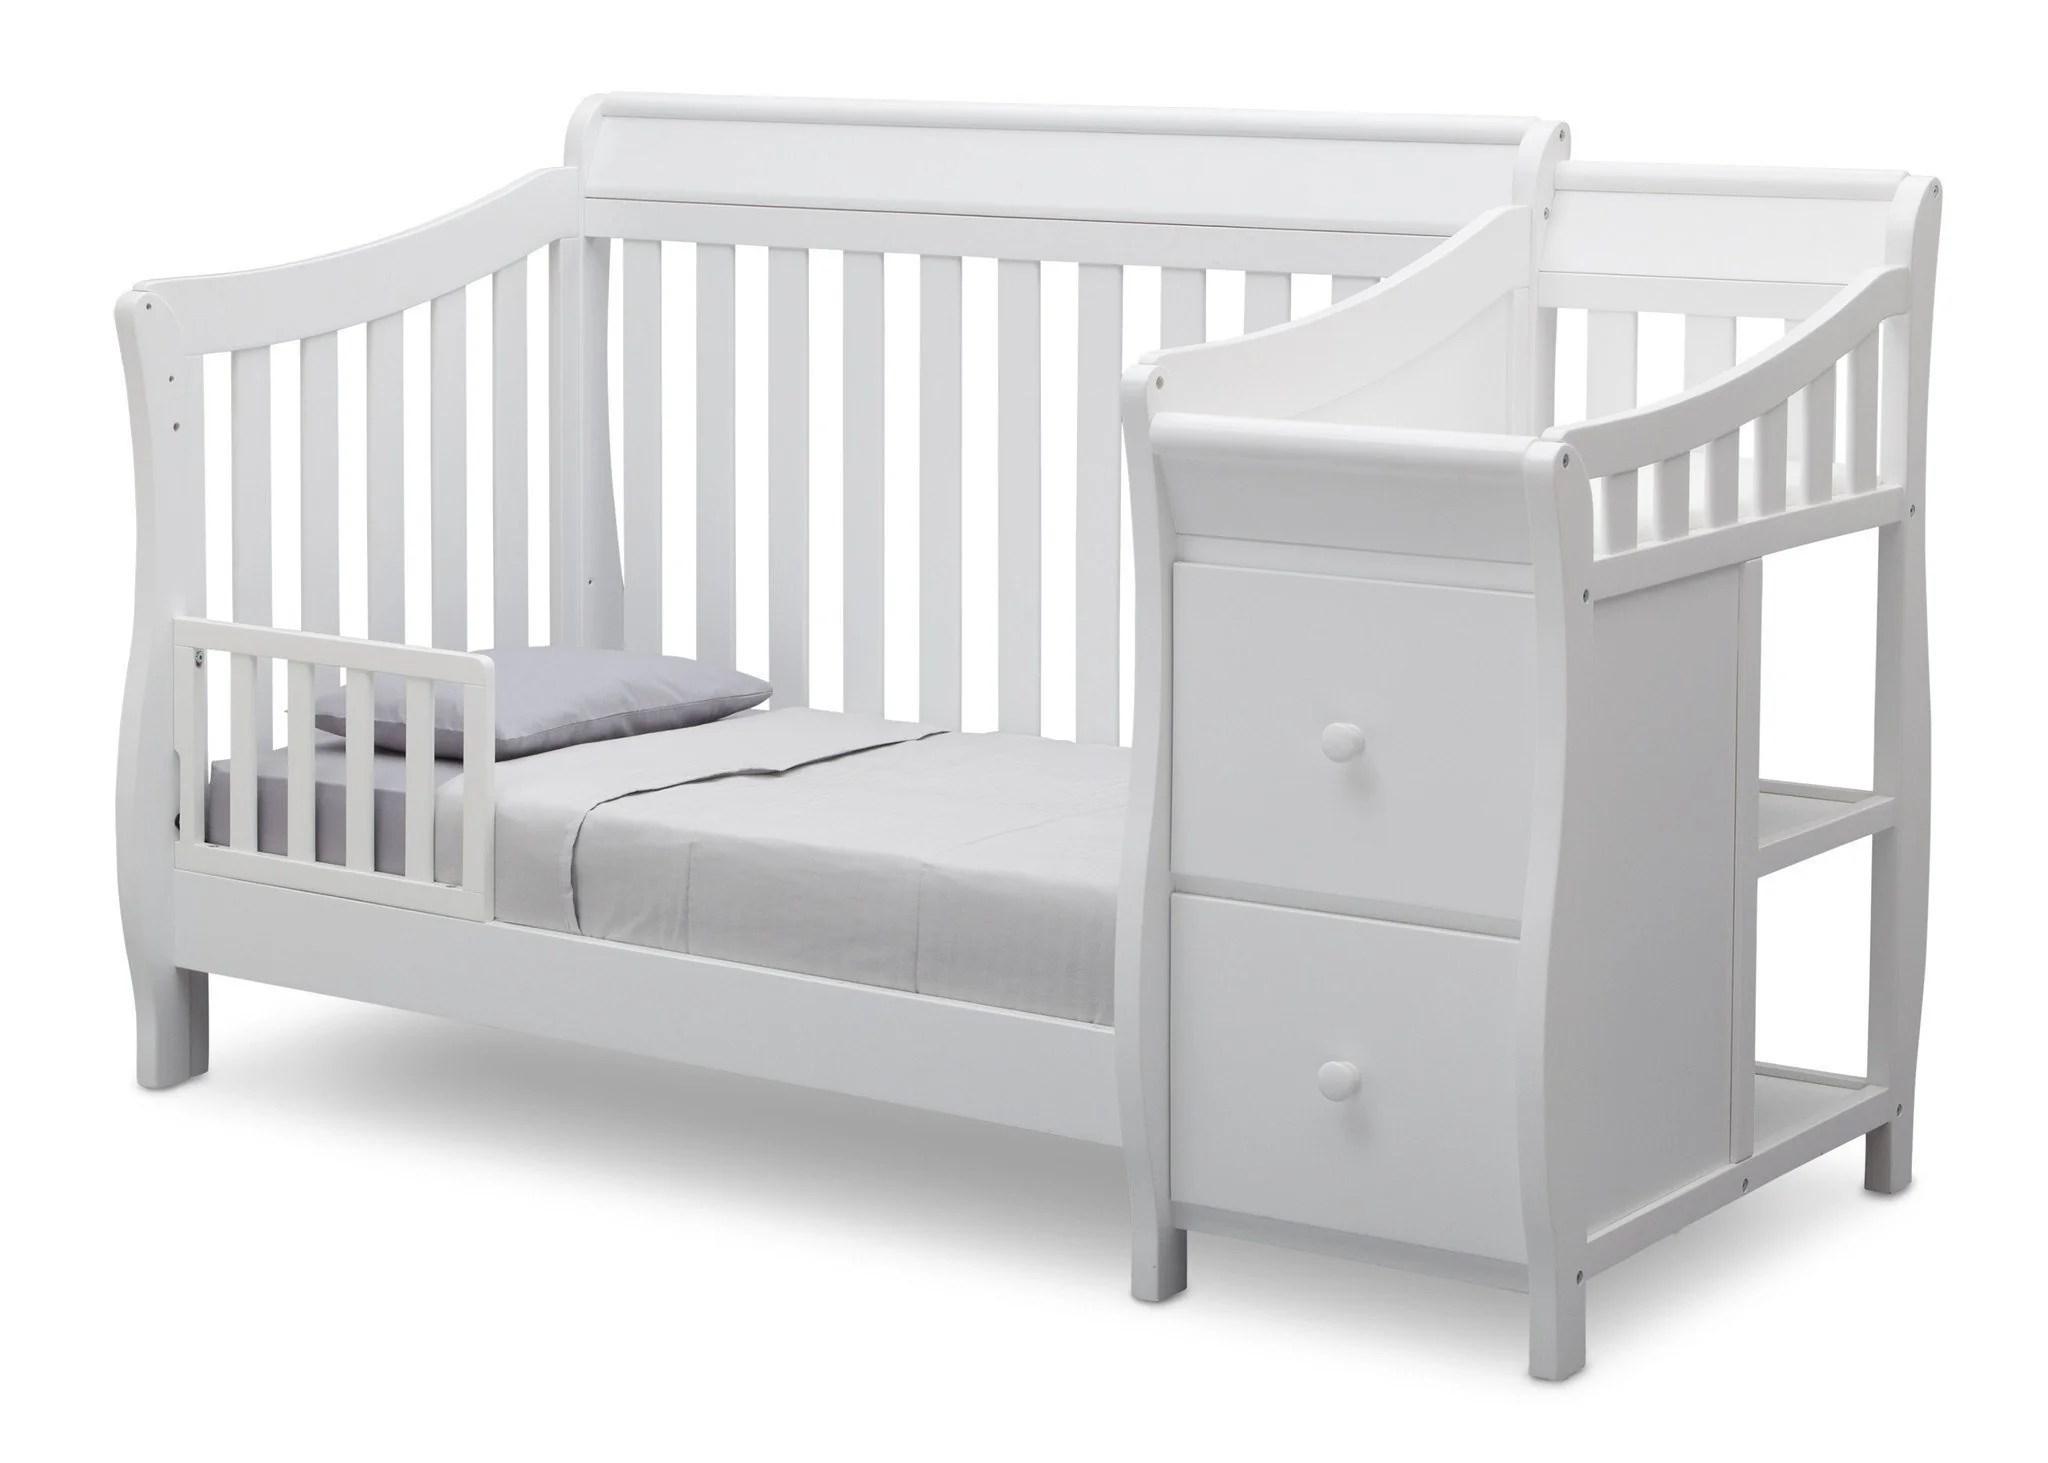 Fullsize Of Toddler Bed Mattress